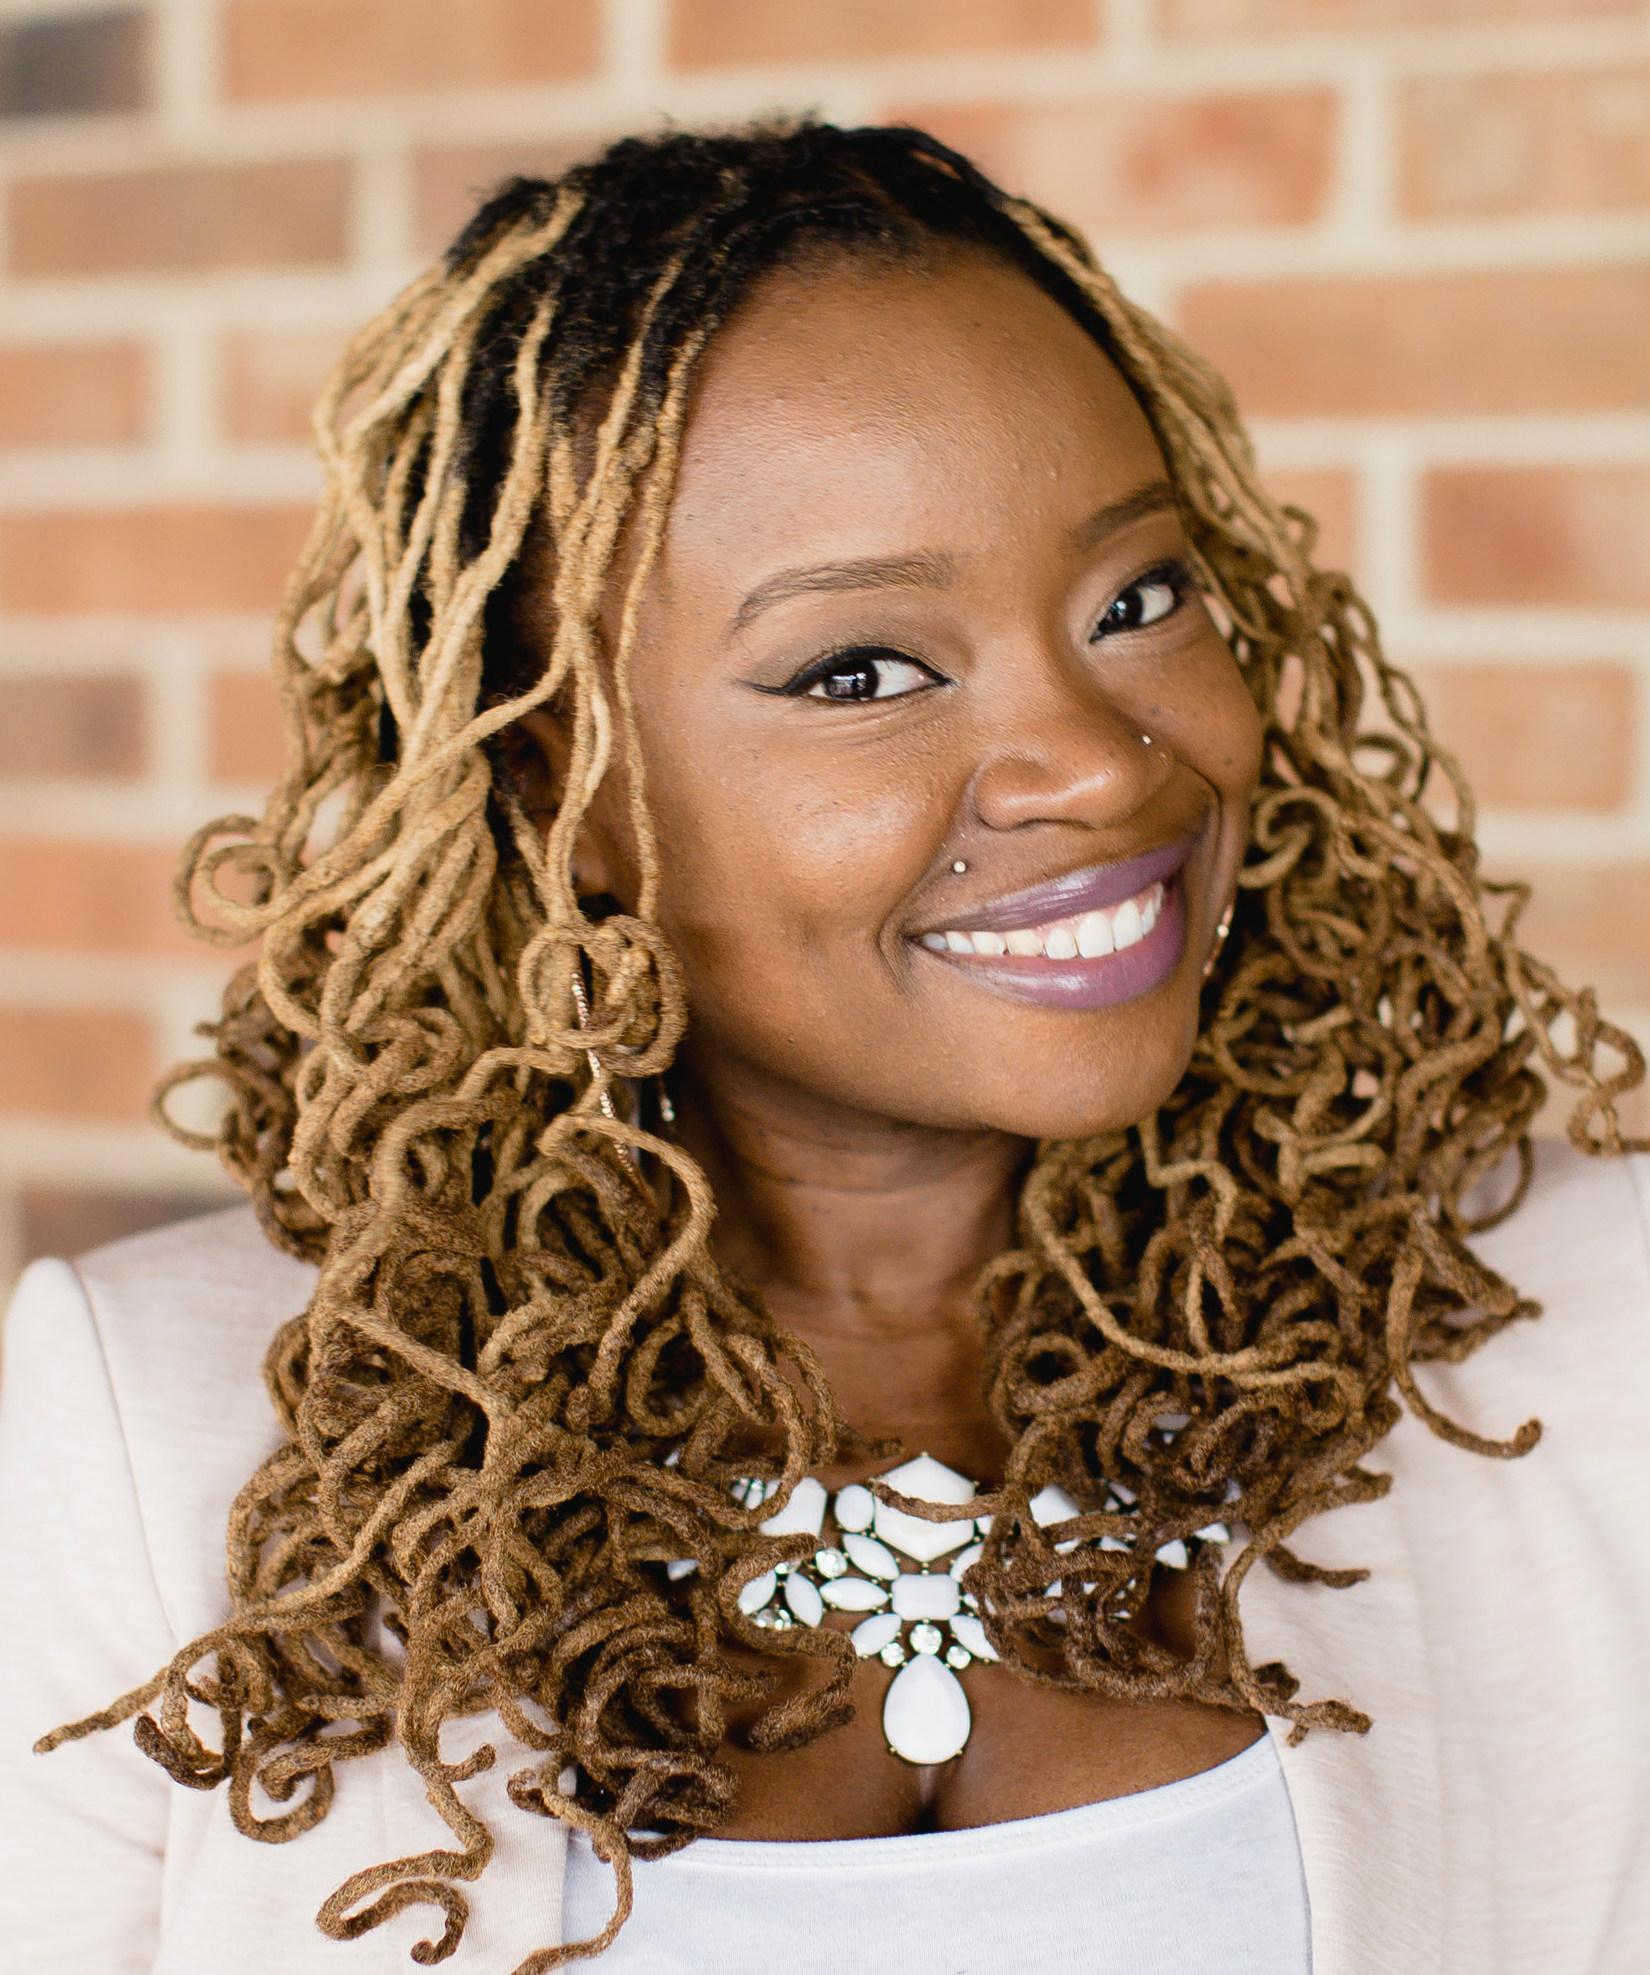 Mercy Chikowore